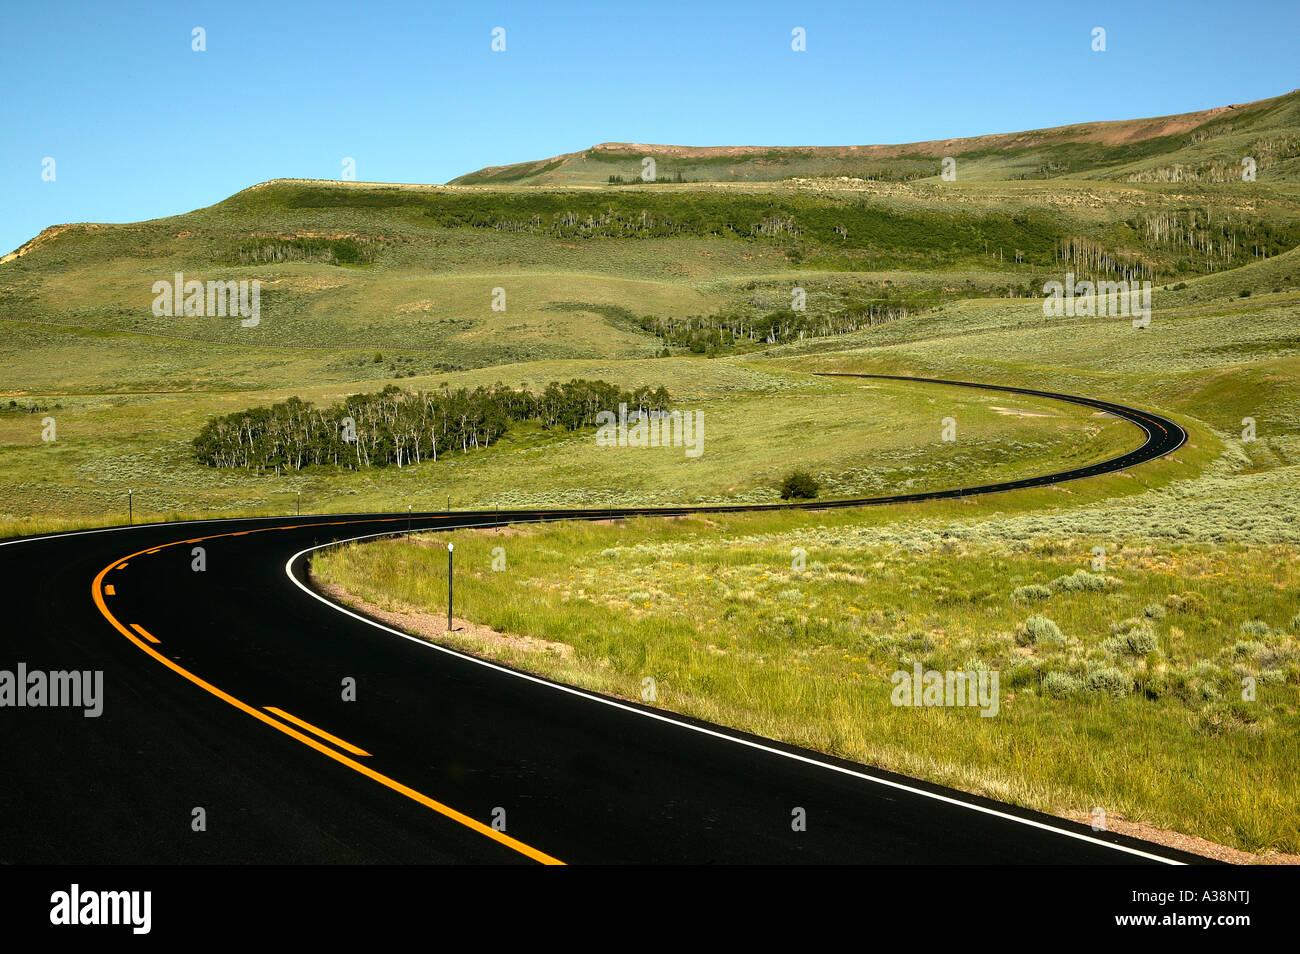 Highway curves with orange center striping, Utah - Stock Image